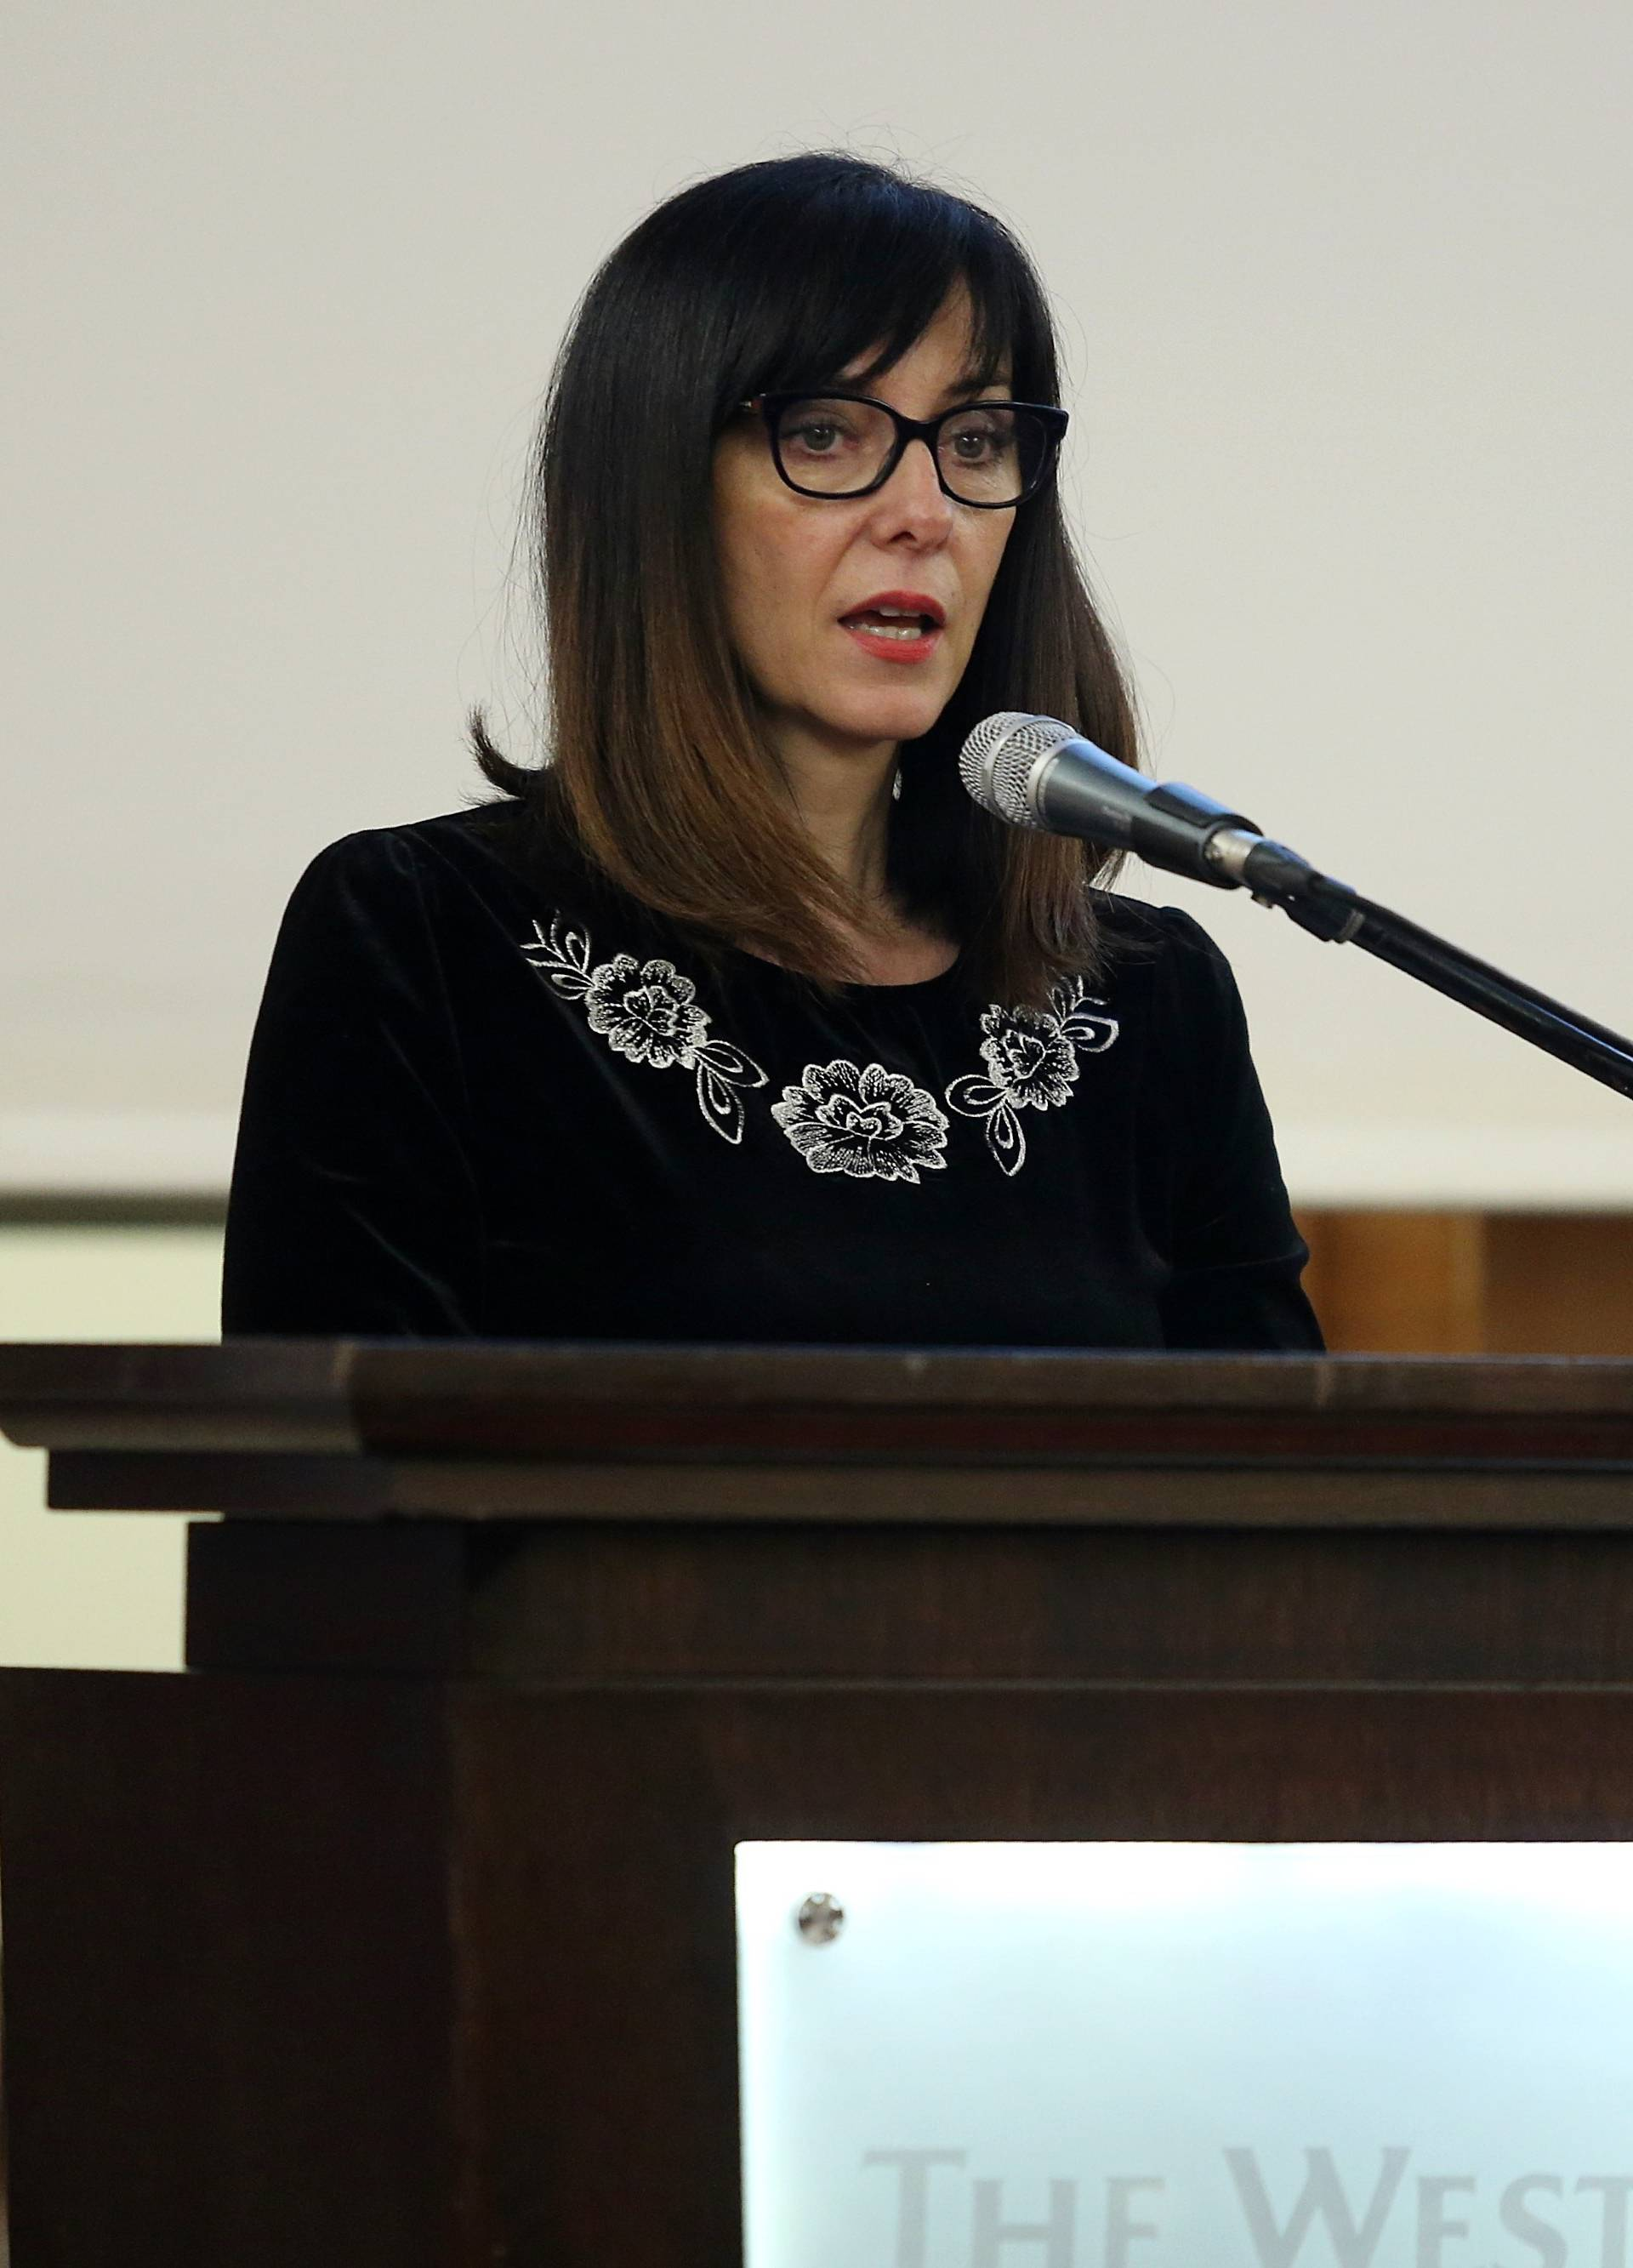 'Kvalifikacije treba razlikovati po vrsti, ali ne diskriminirati'